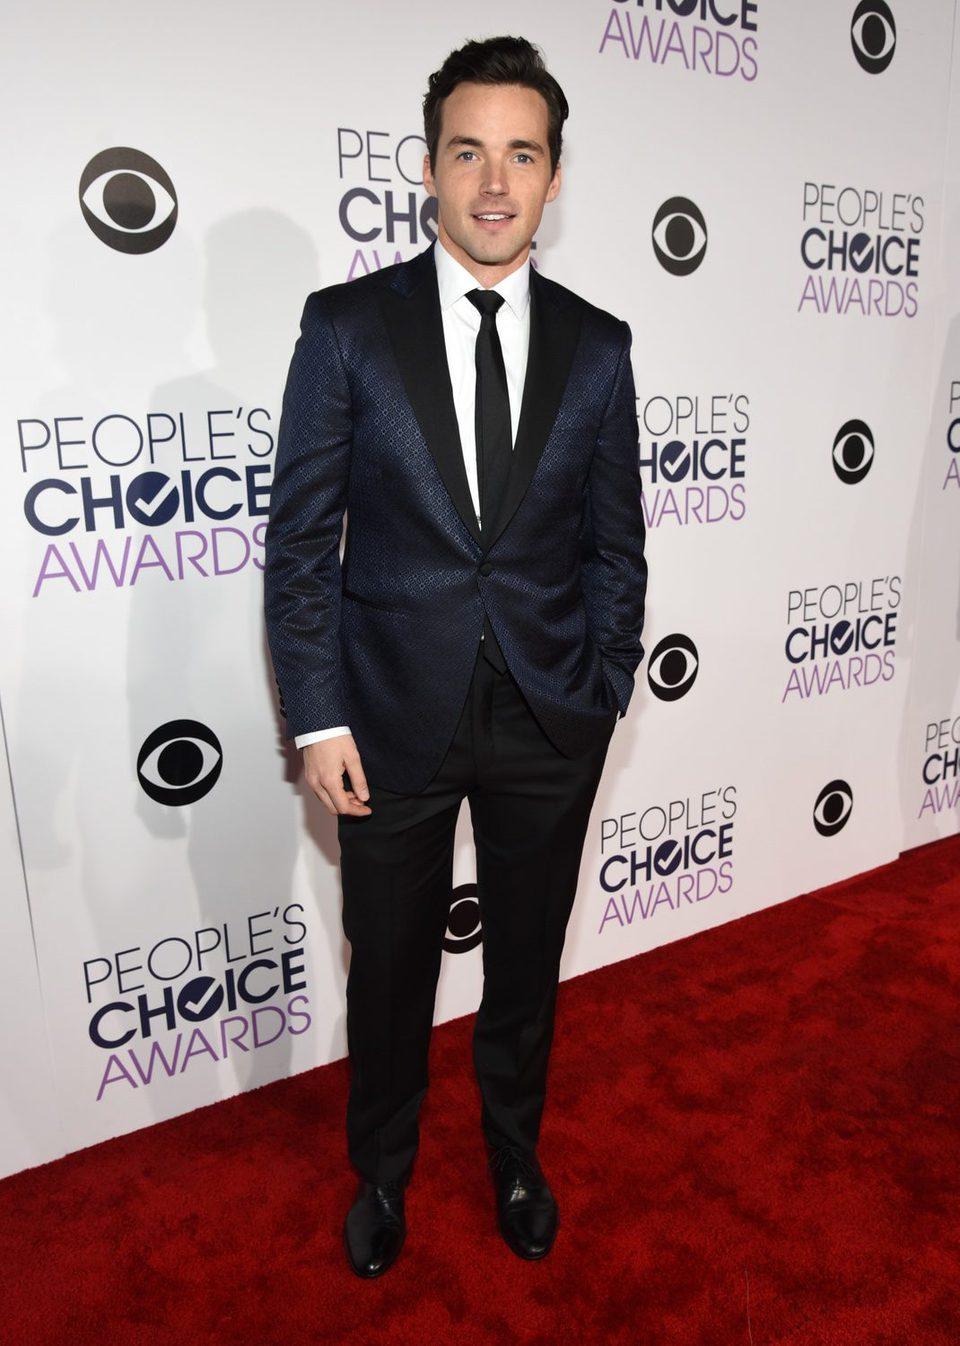 Ian Harding durante los People's Choice Awards 2016